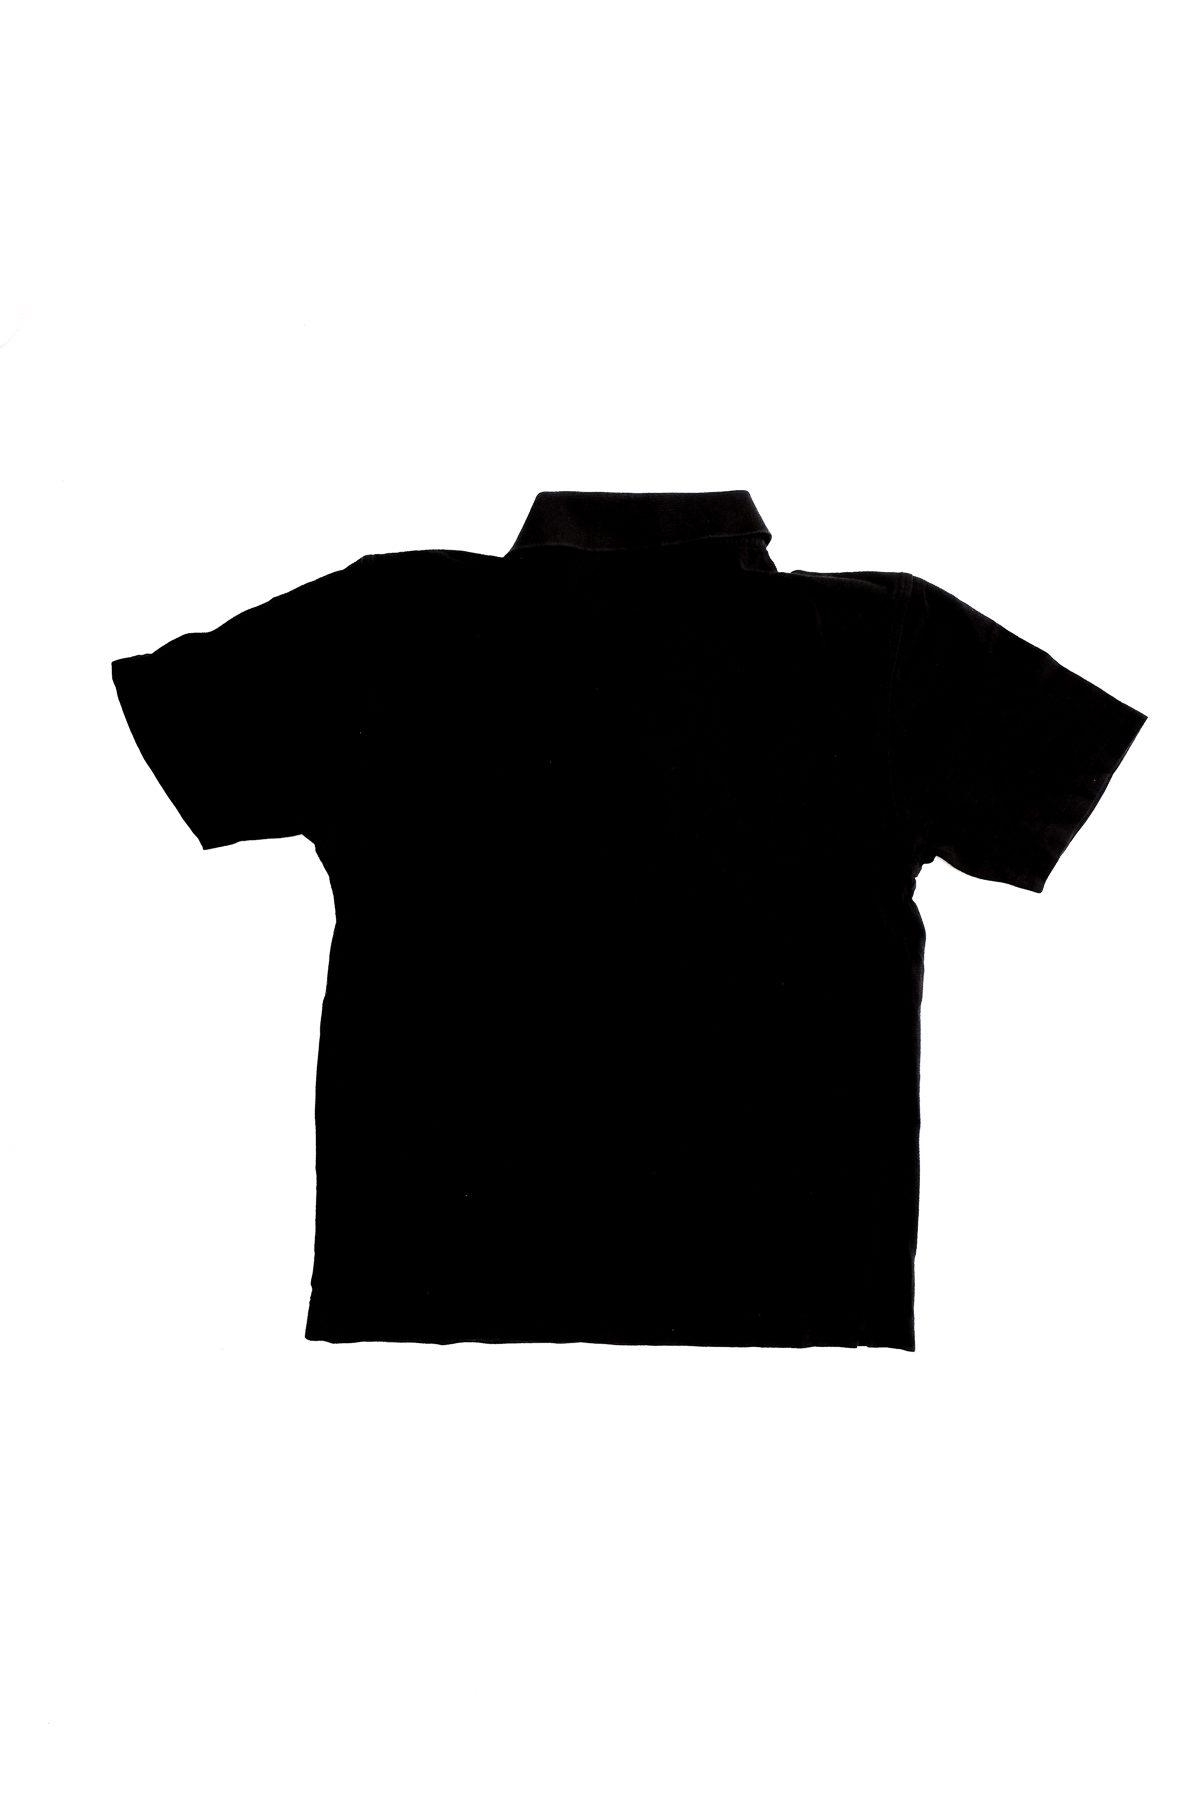 Lacoste POLO VINTAGE Black